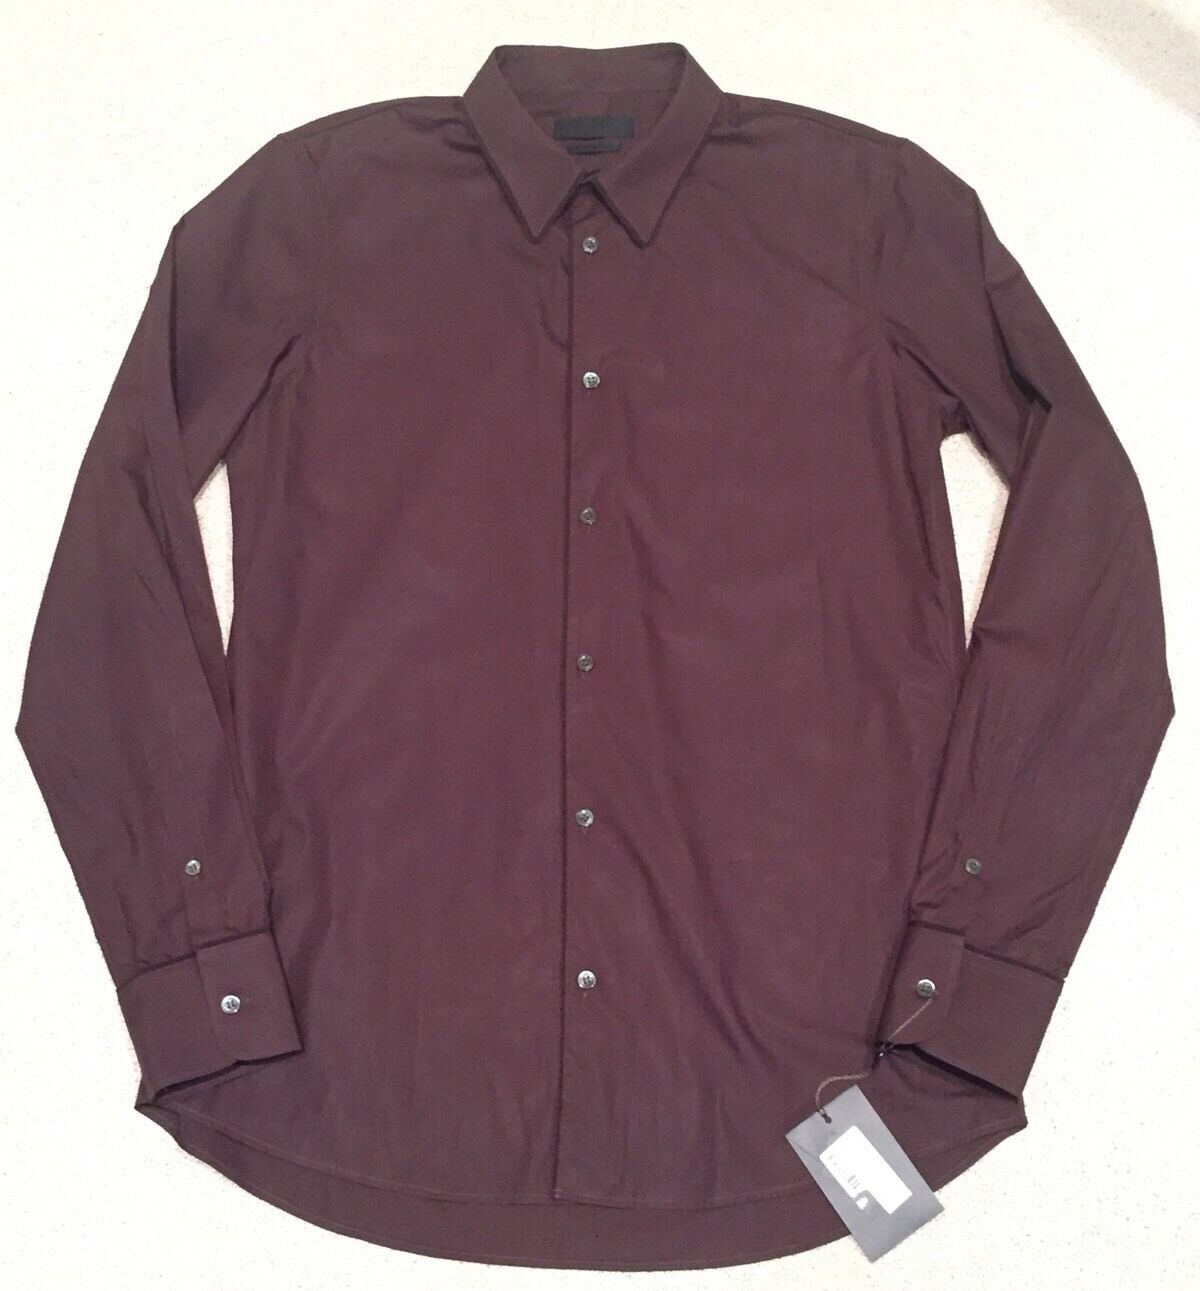 NWT 895 ALEXANDER McMQUEEN Ebony Dress Shirt w/ Grosgrain Trim SZ 50